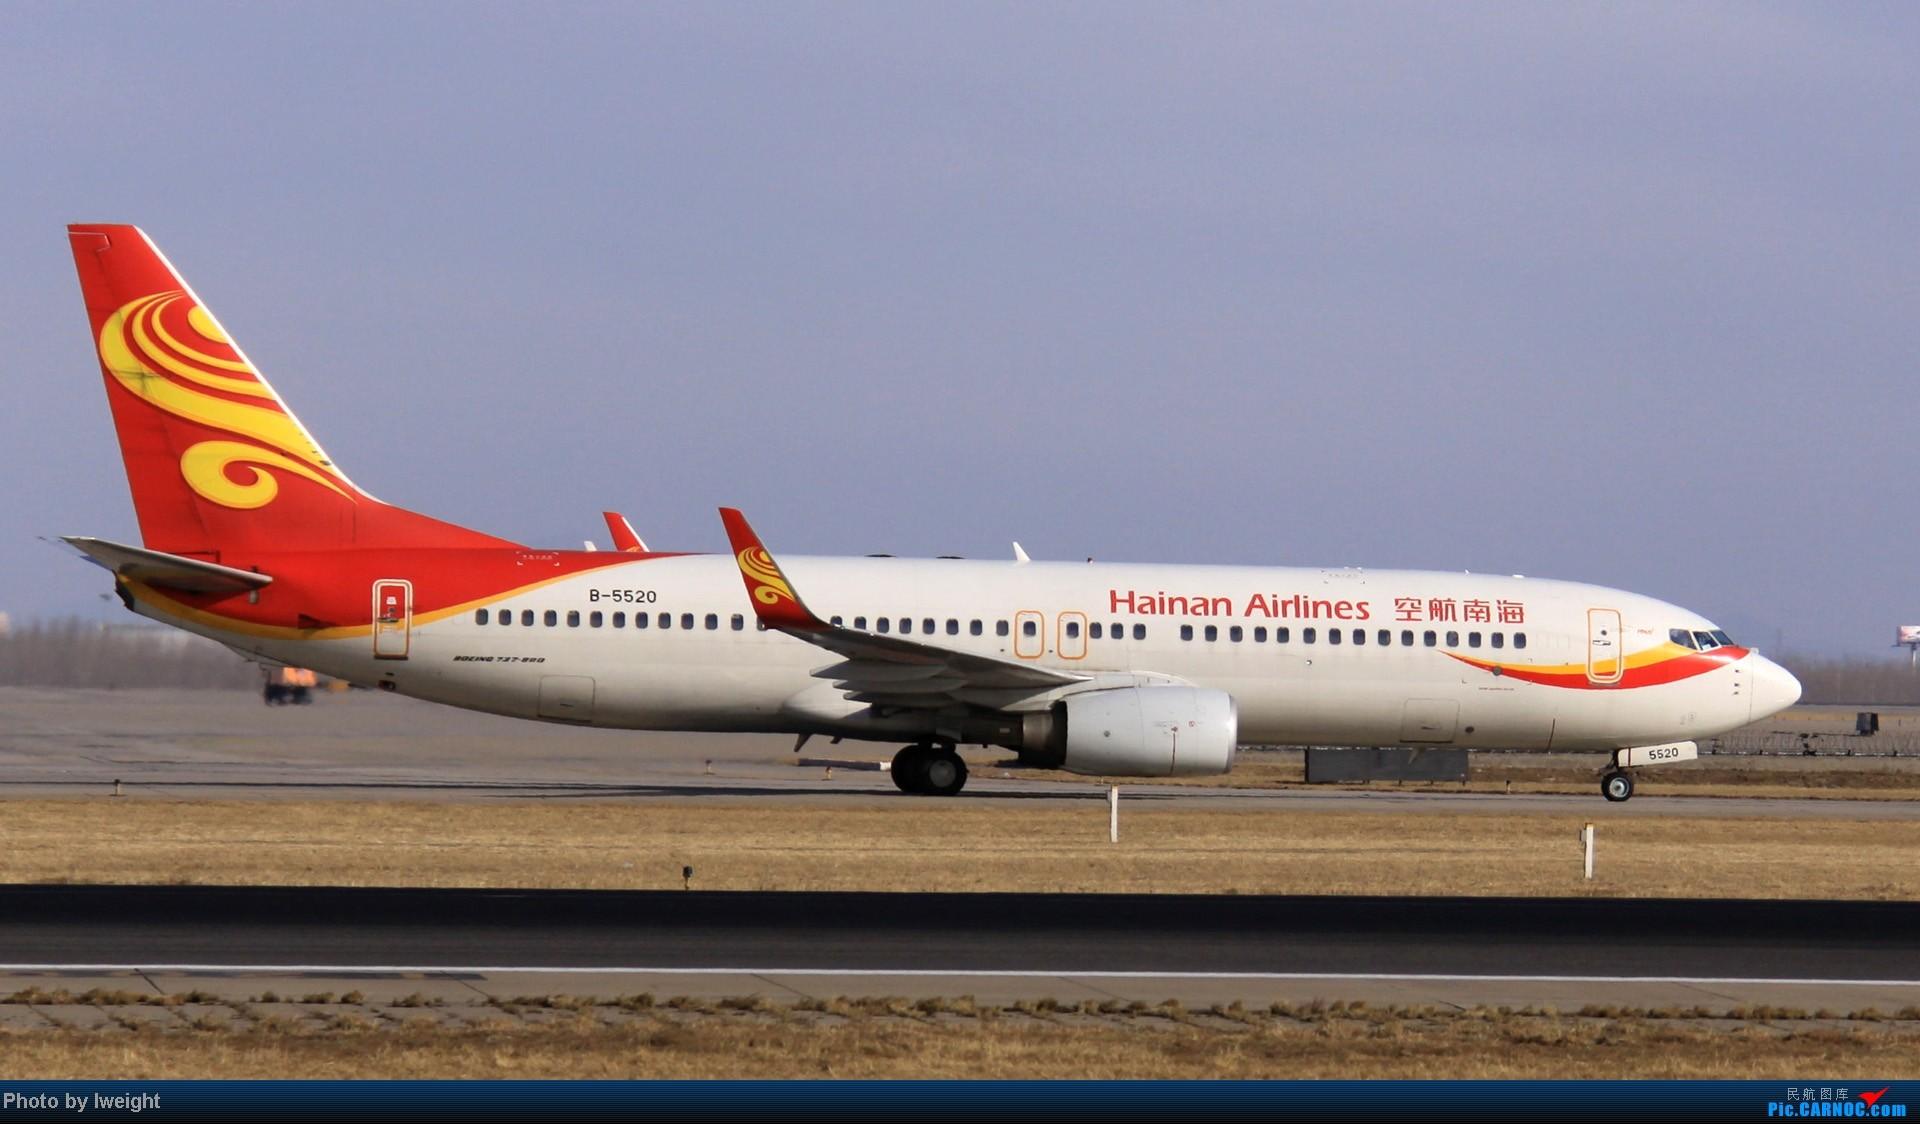 Re:[原创]今天下午瞎拍两个小时的杂图 BOEING 737-800 B-5520 中国北京首都机场